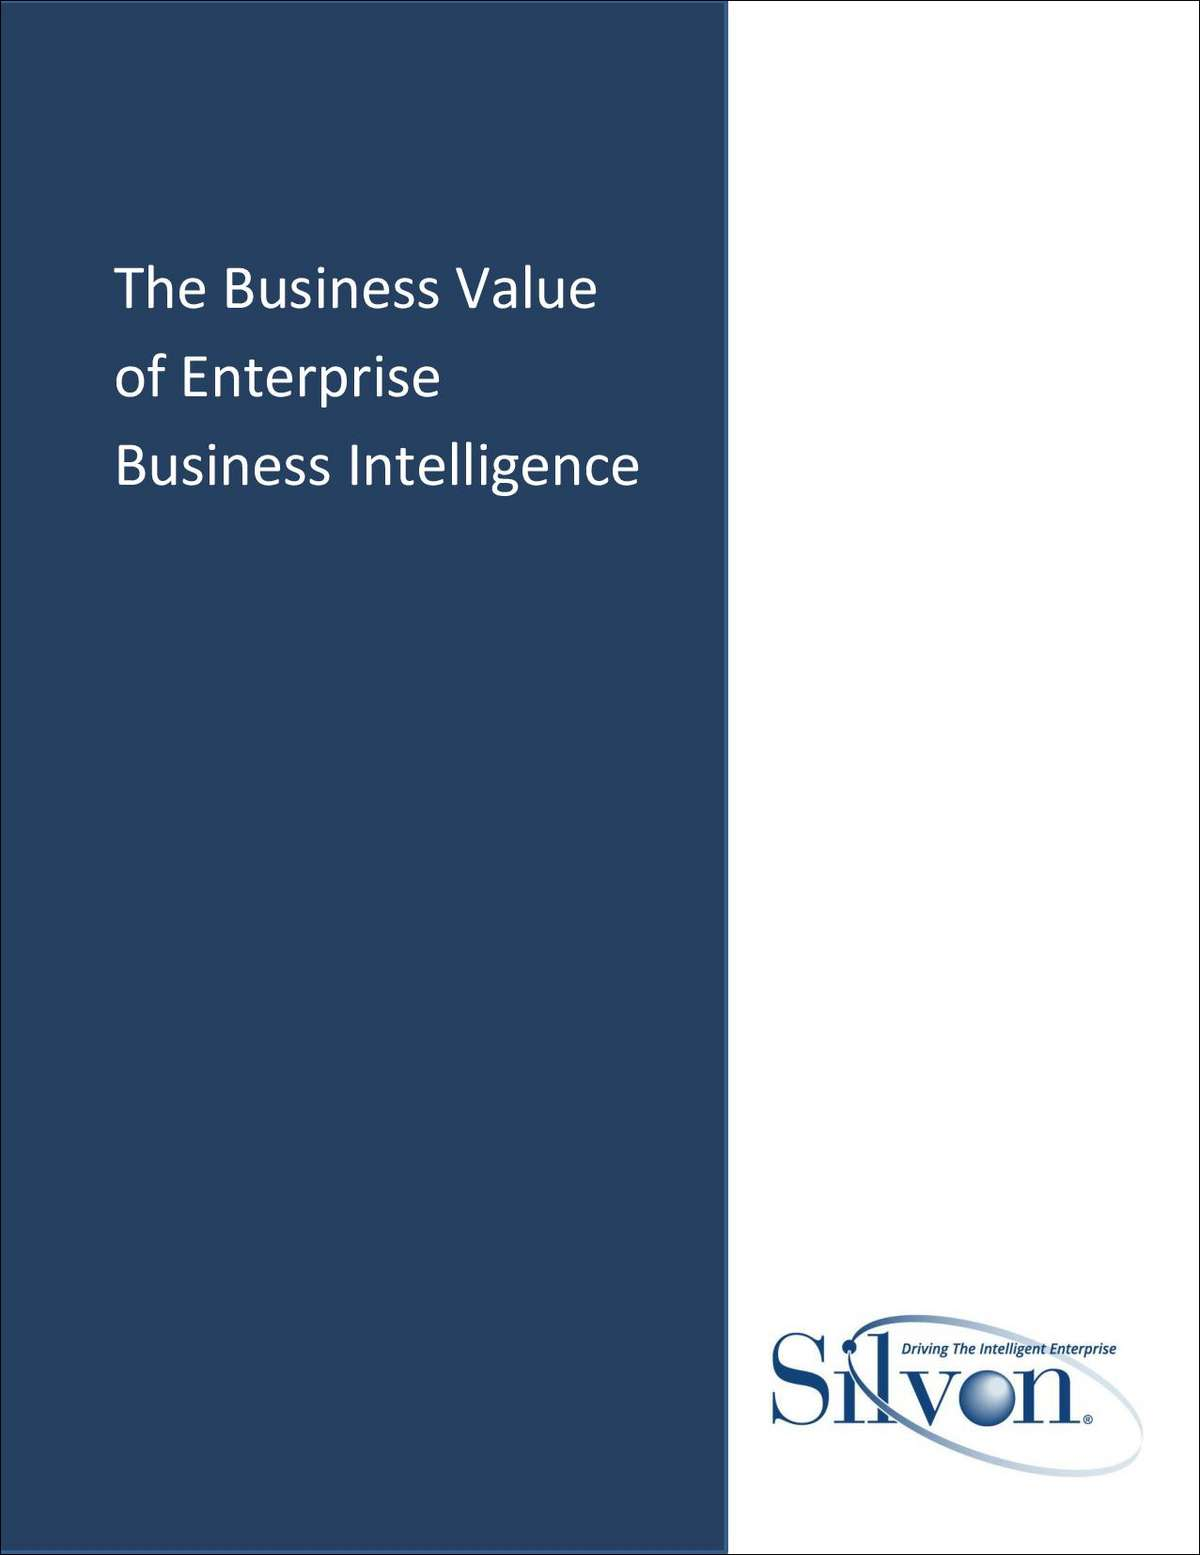 The Business Value of Enterprise Business Intelligence